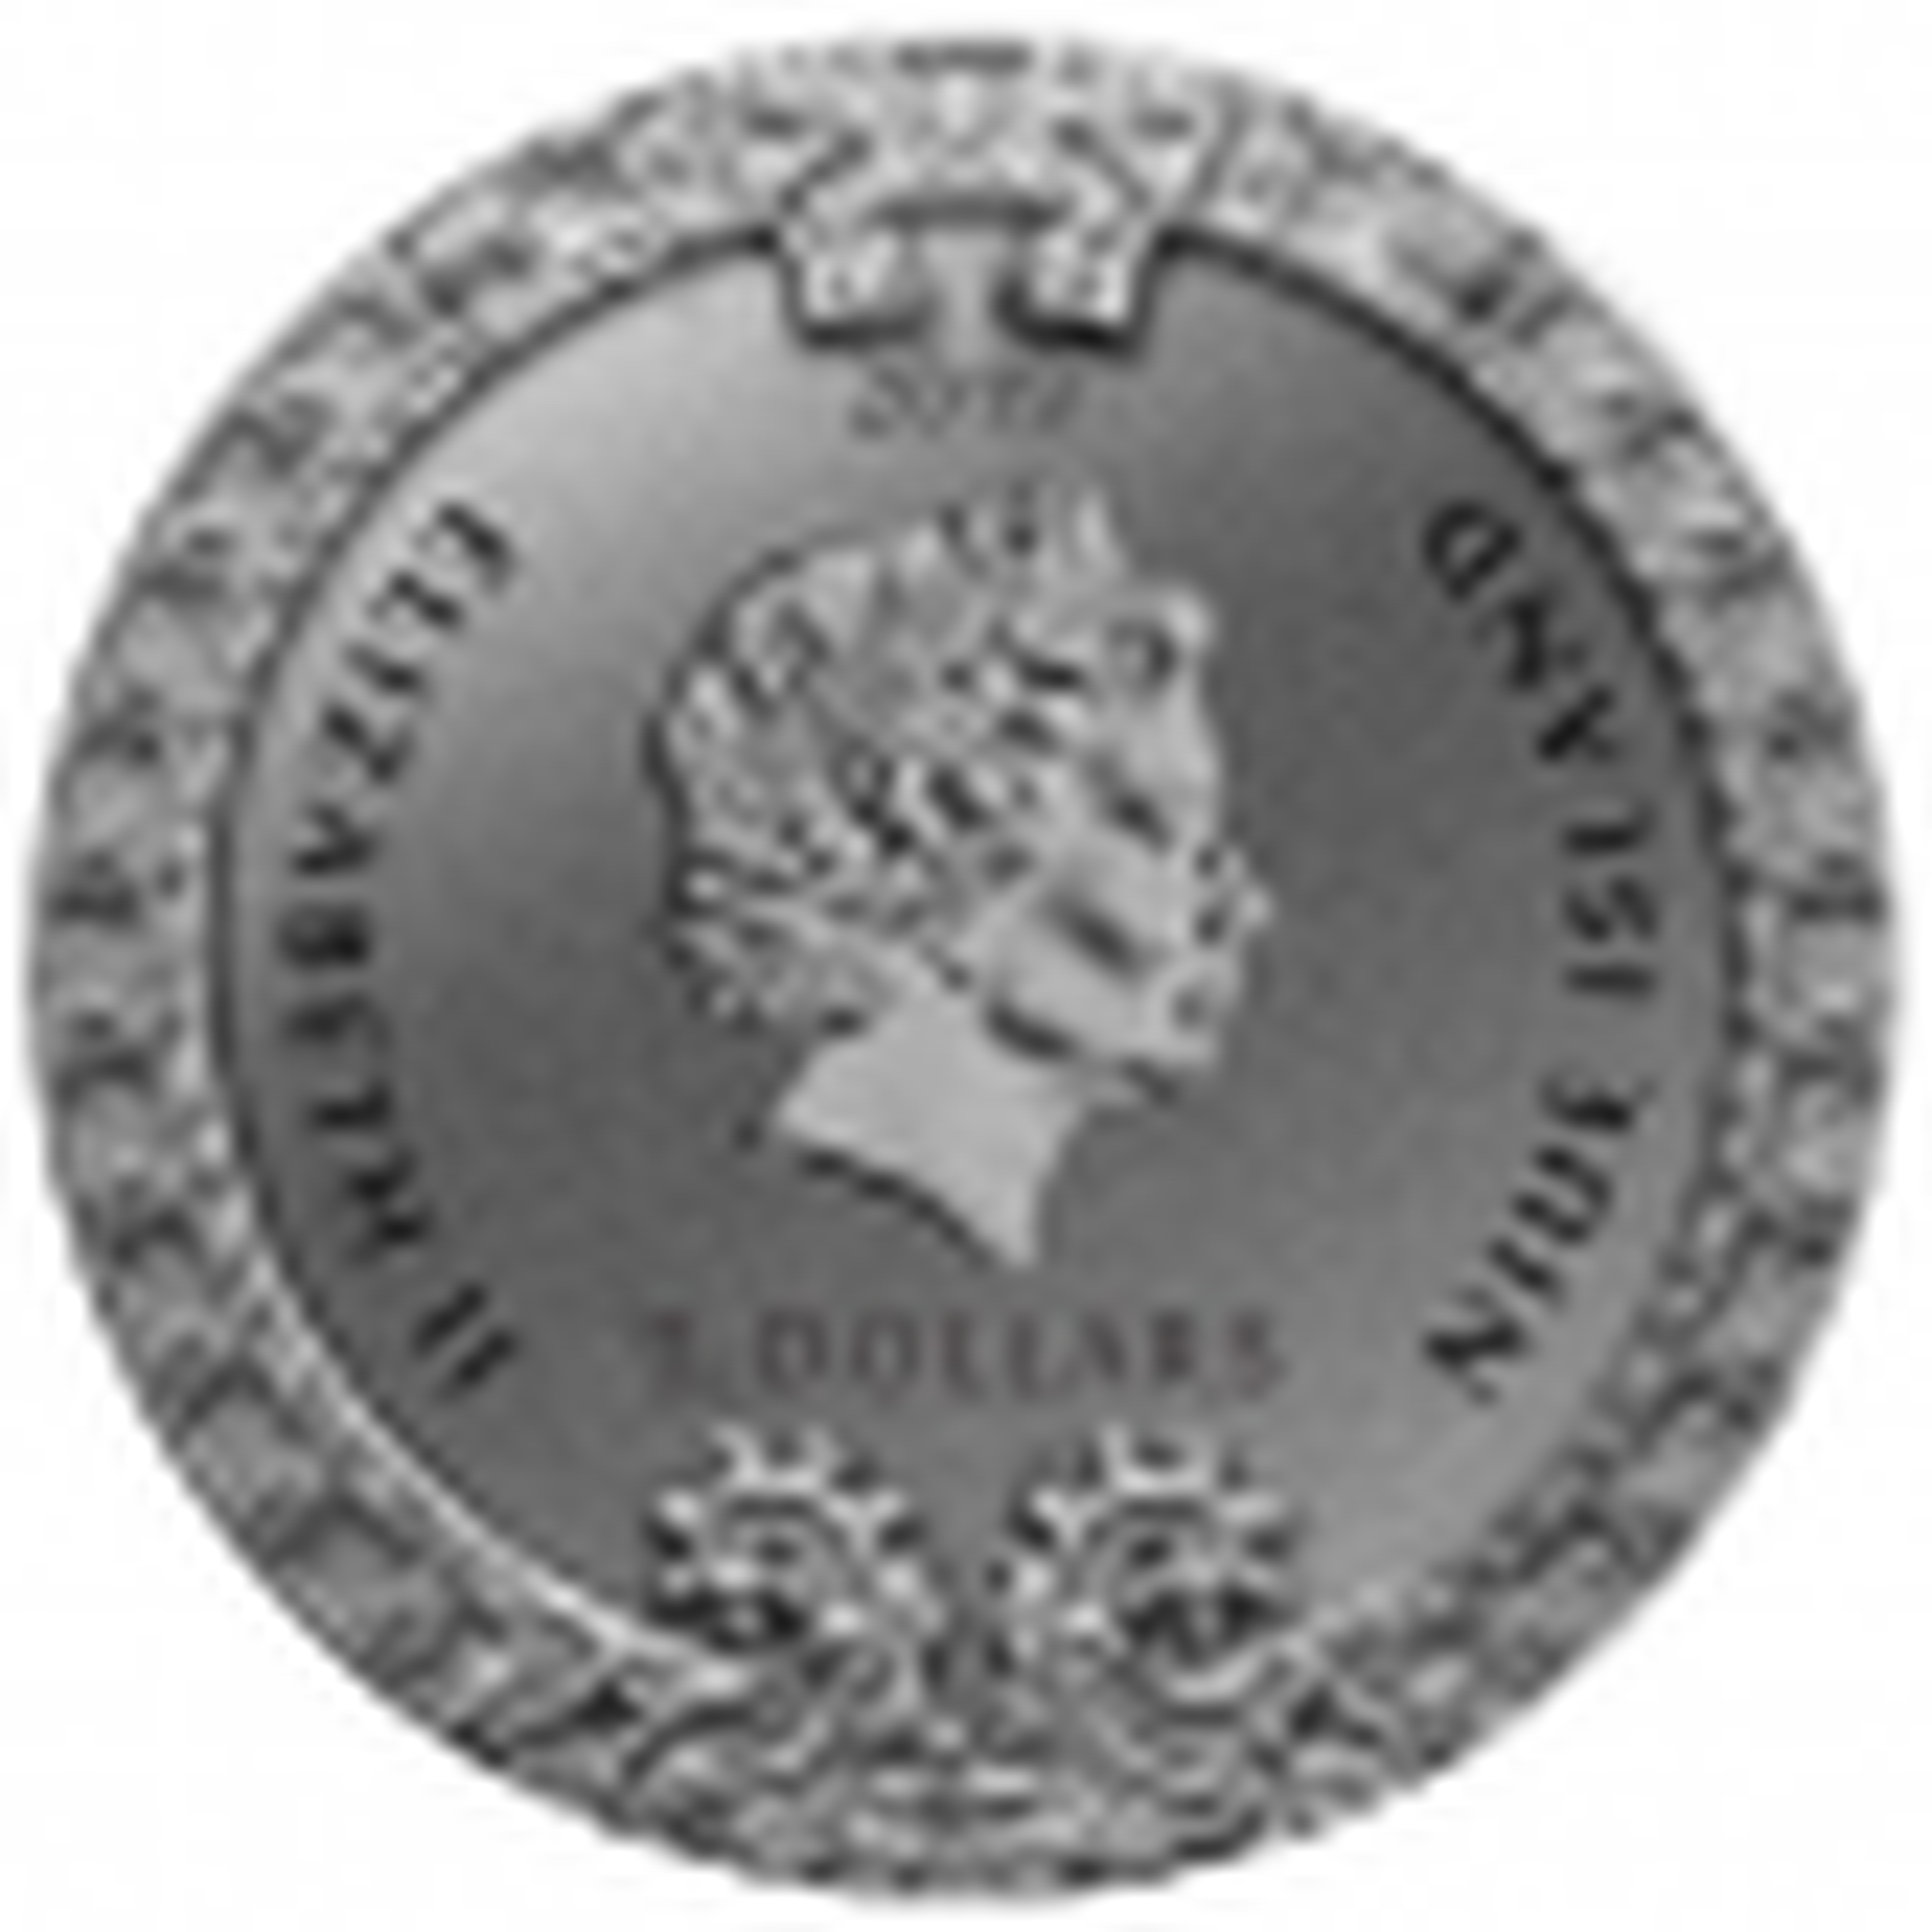 2 Troy ounce zilveren munt Niue Azteekse kalender 2019 achterzijde